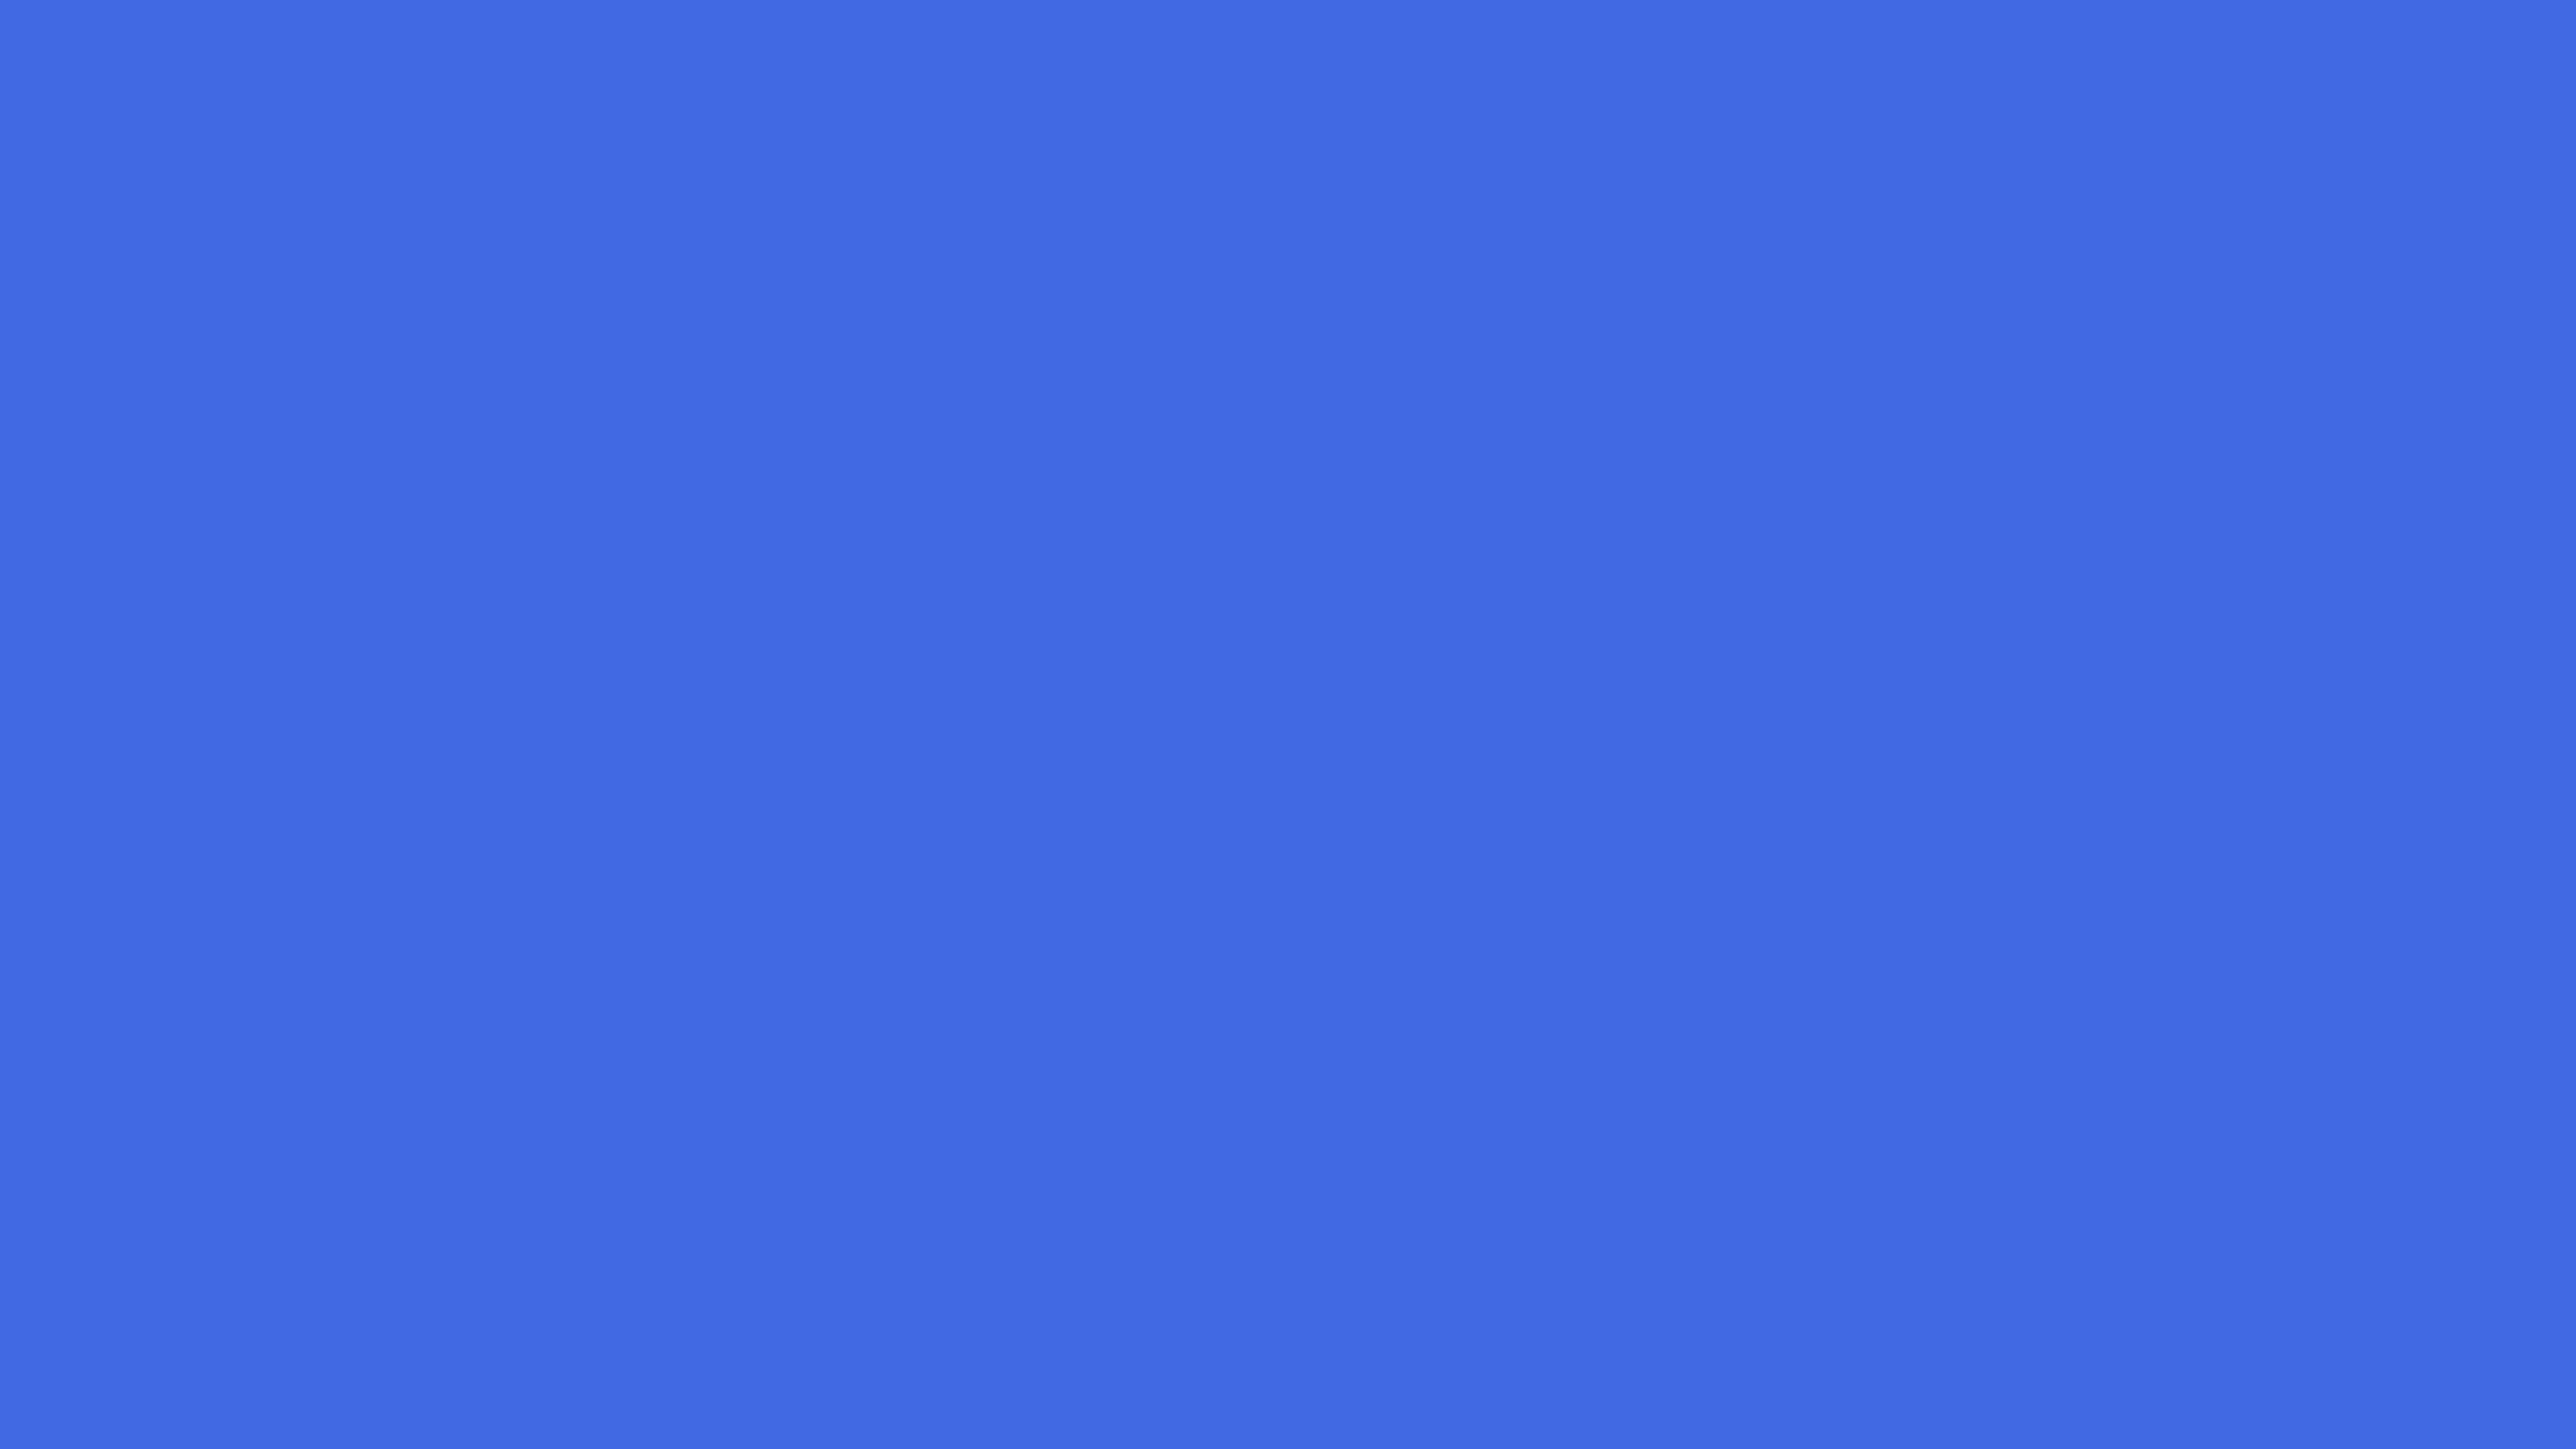 3840x2160 Royal Blue Web Solid Color Background